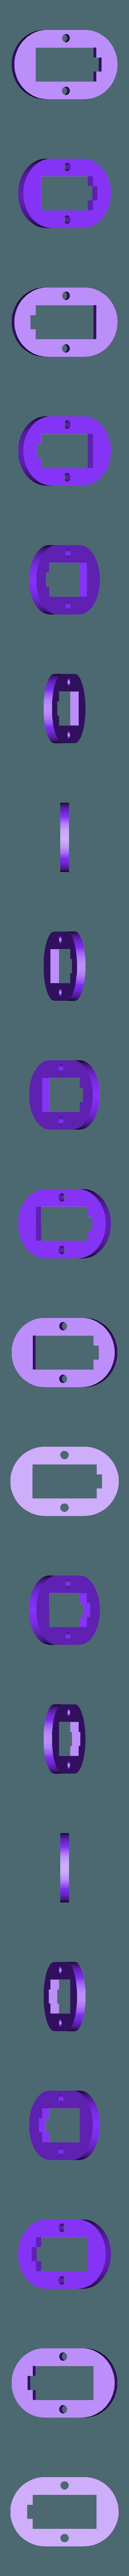 Leg_Servo_Retainer.stl Download free STL file mePed Quadruped Robot • 3D printing template, MinorSymphony